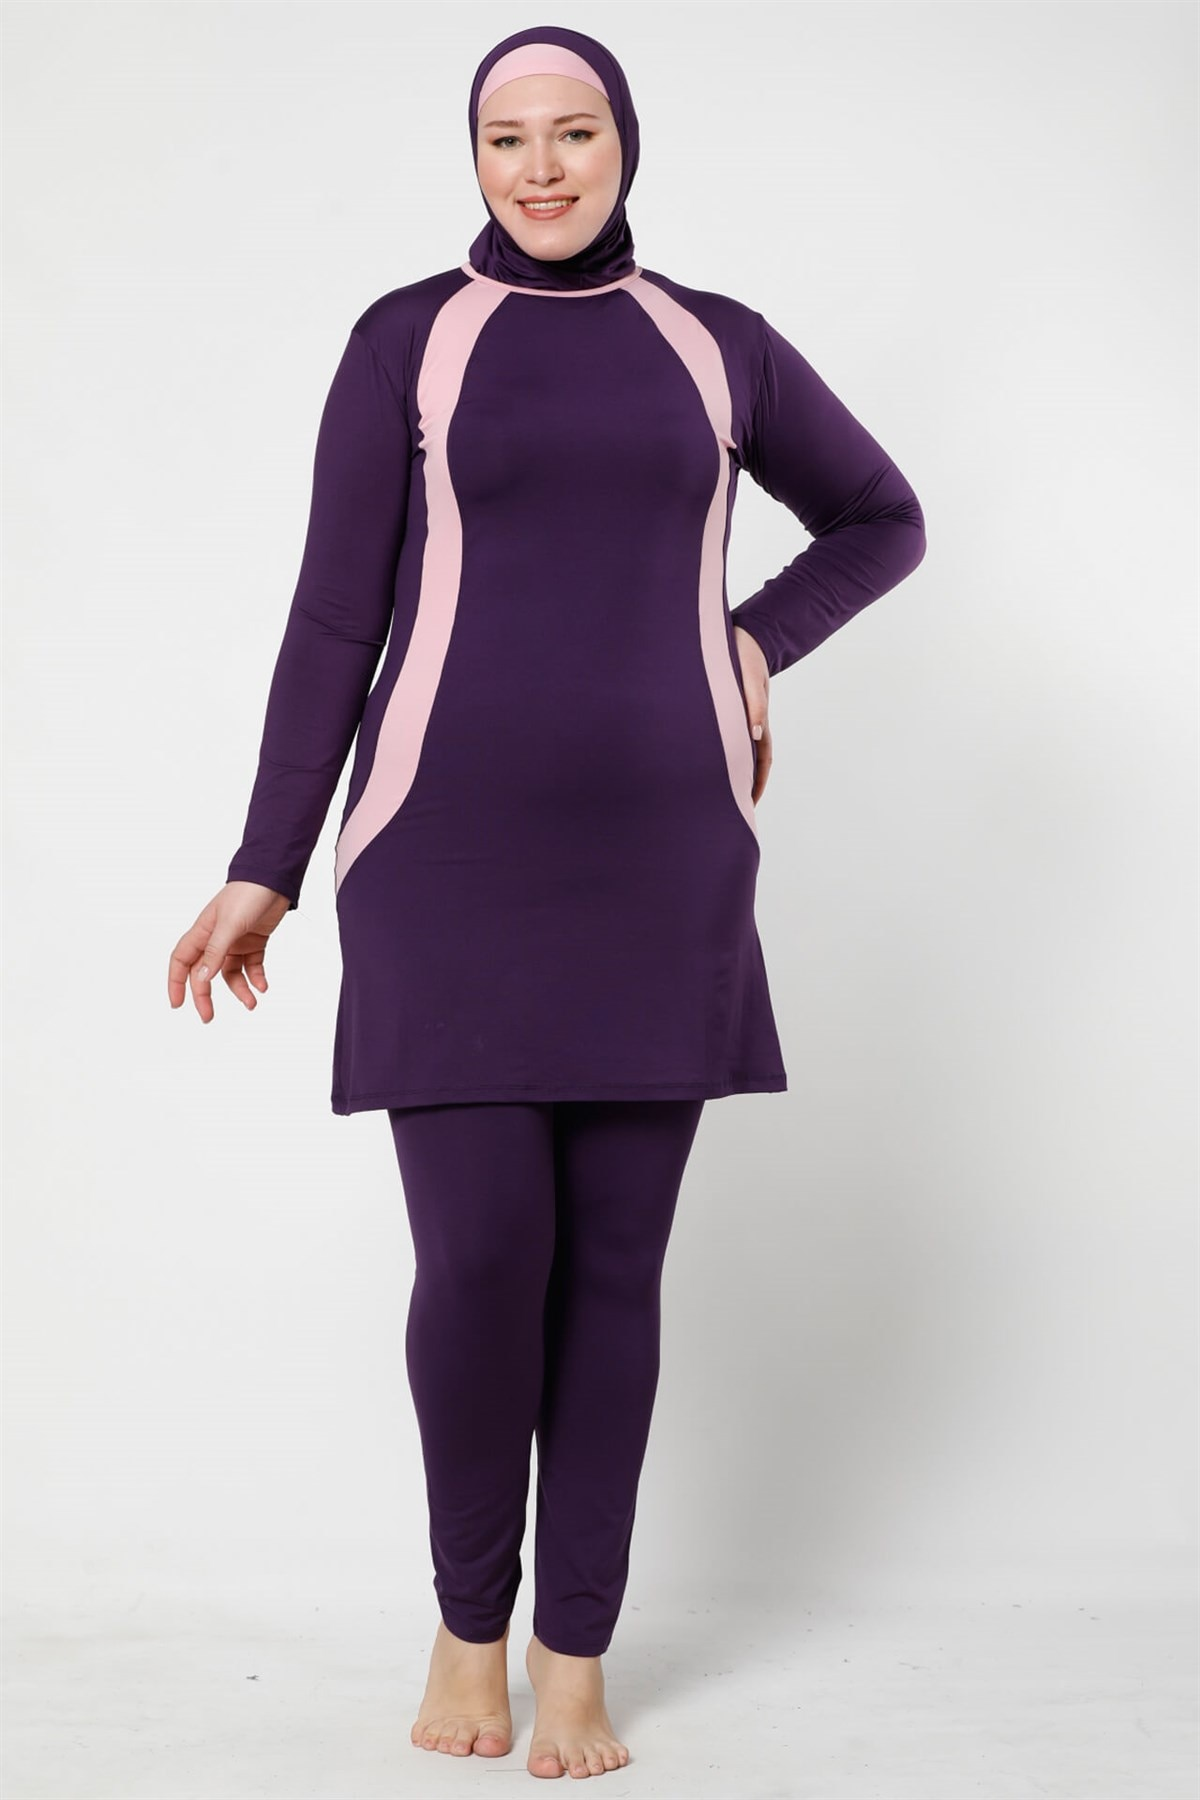 Fashion Cartoon Full Closed The Tights Lycra Large Size Hijab swimwear 28008